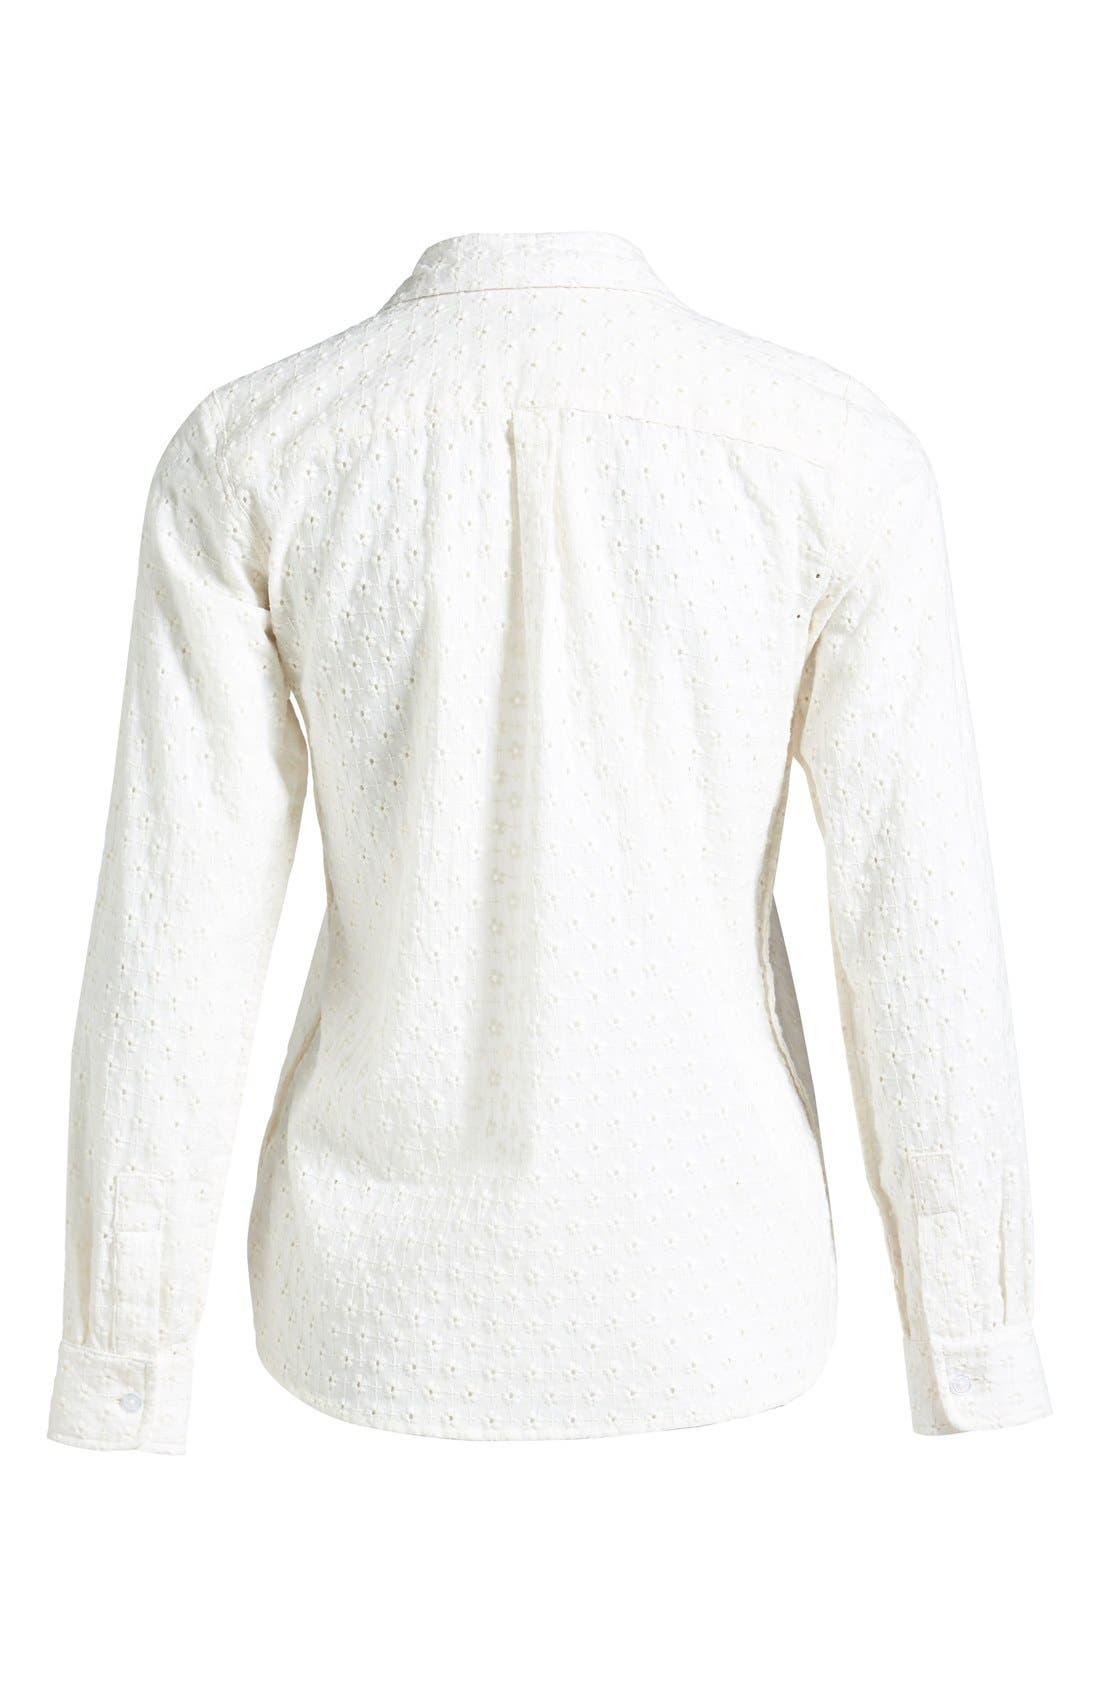 STEVEN ALAN,                             Reverse Seam Shirt,                             Alternate thumbnail 2, color,                             100